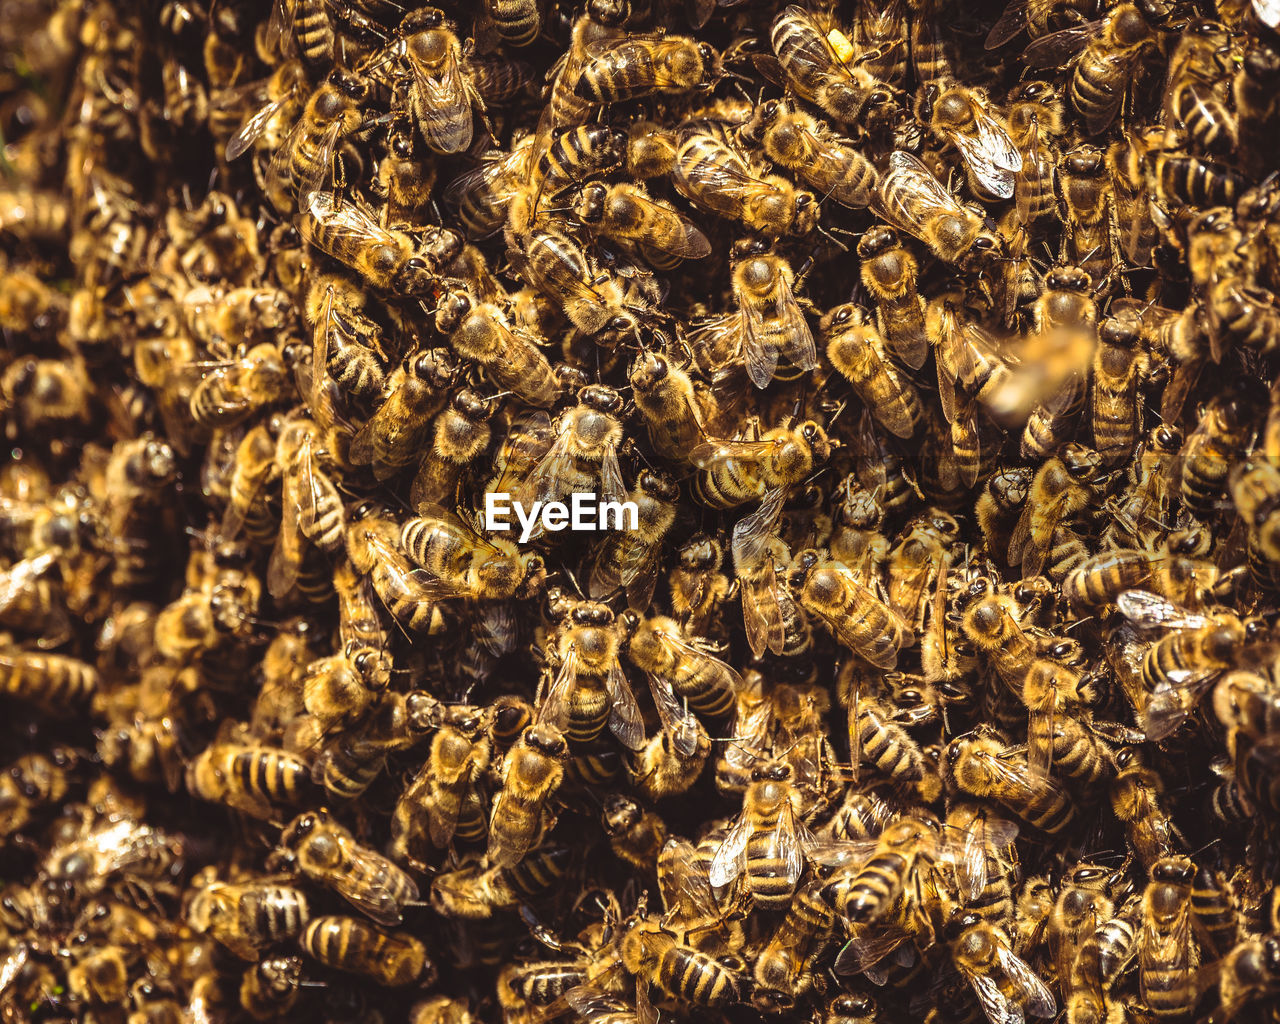 FULL FRAME SHOT OF BEE ON THE GROUND